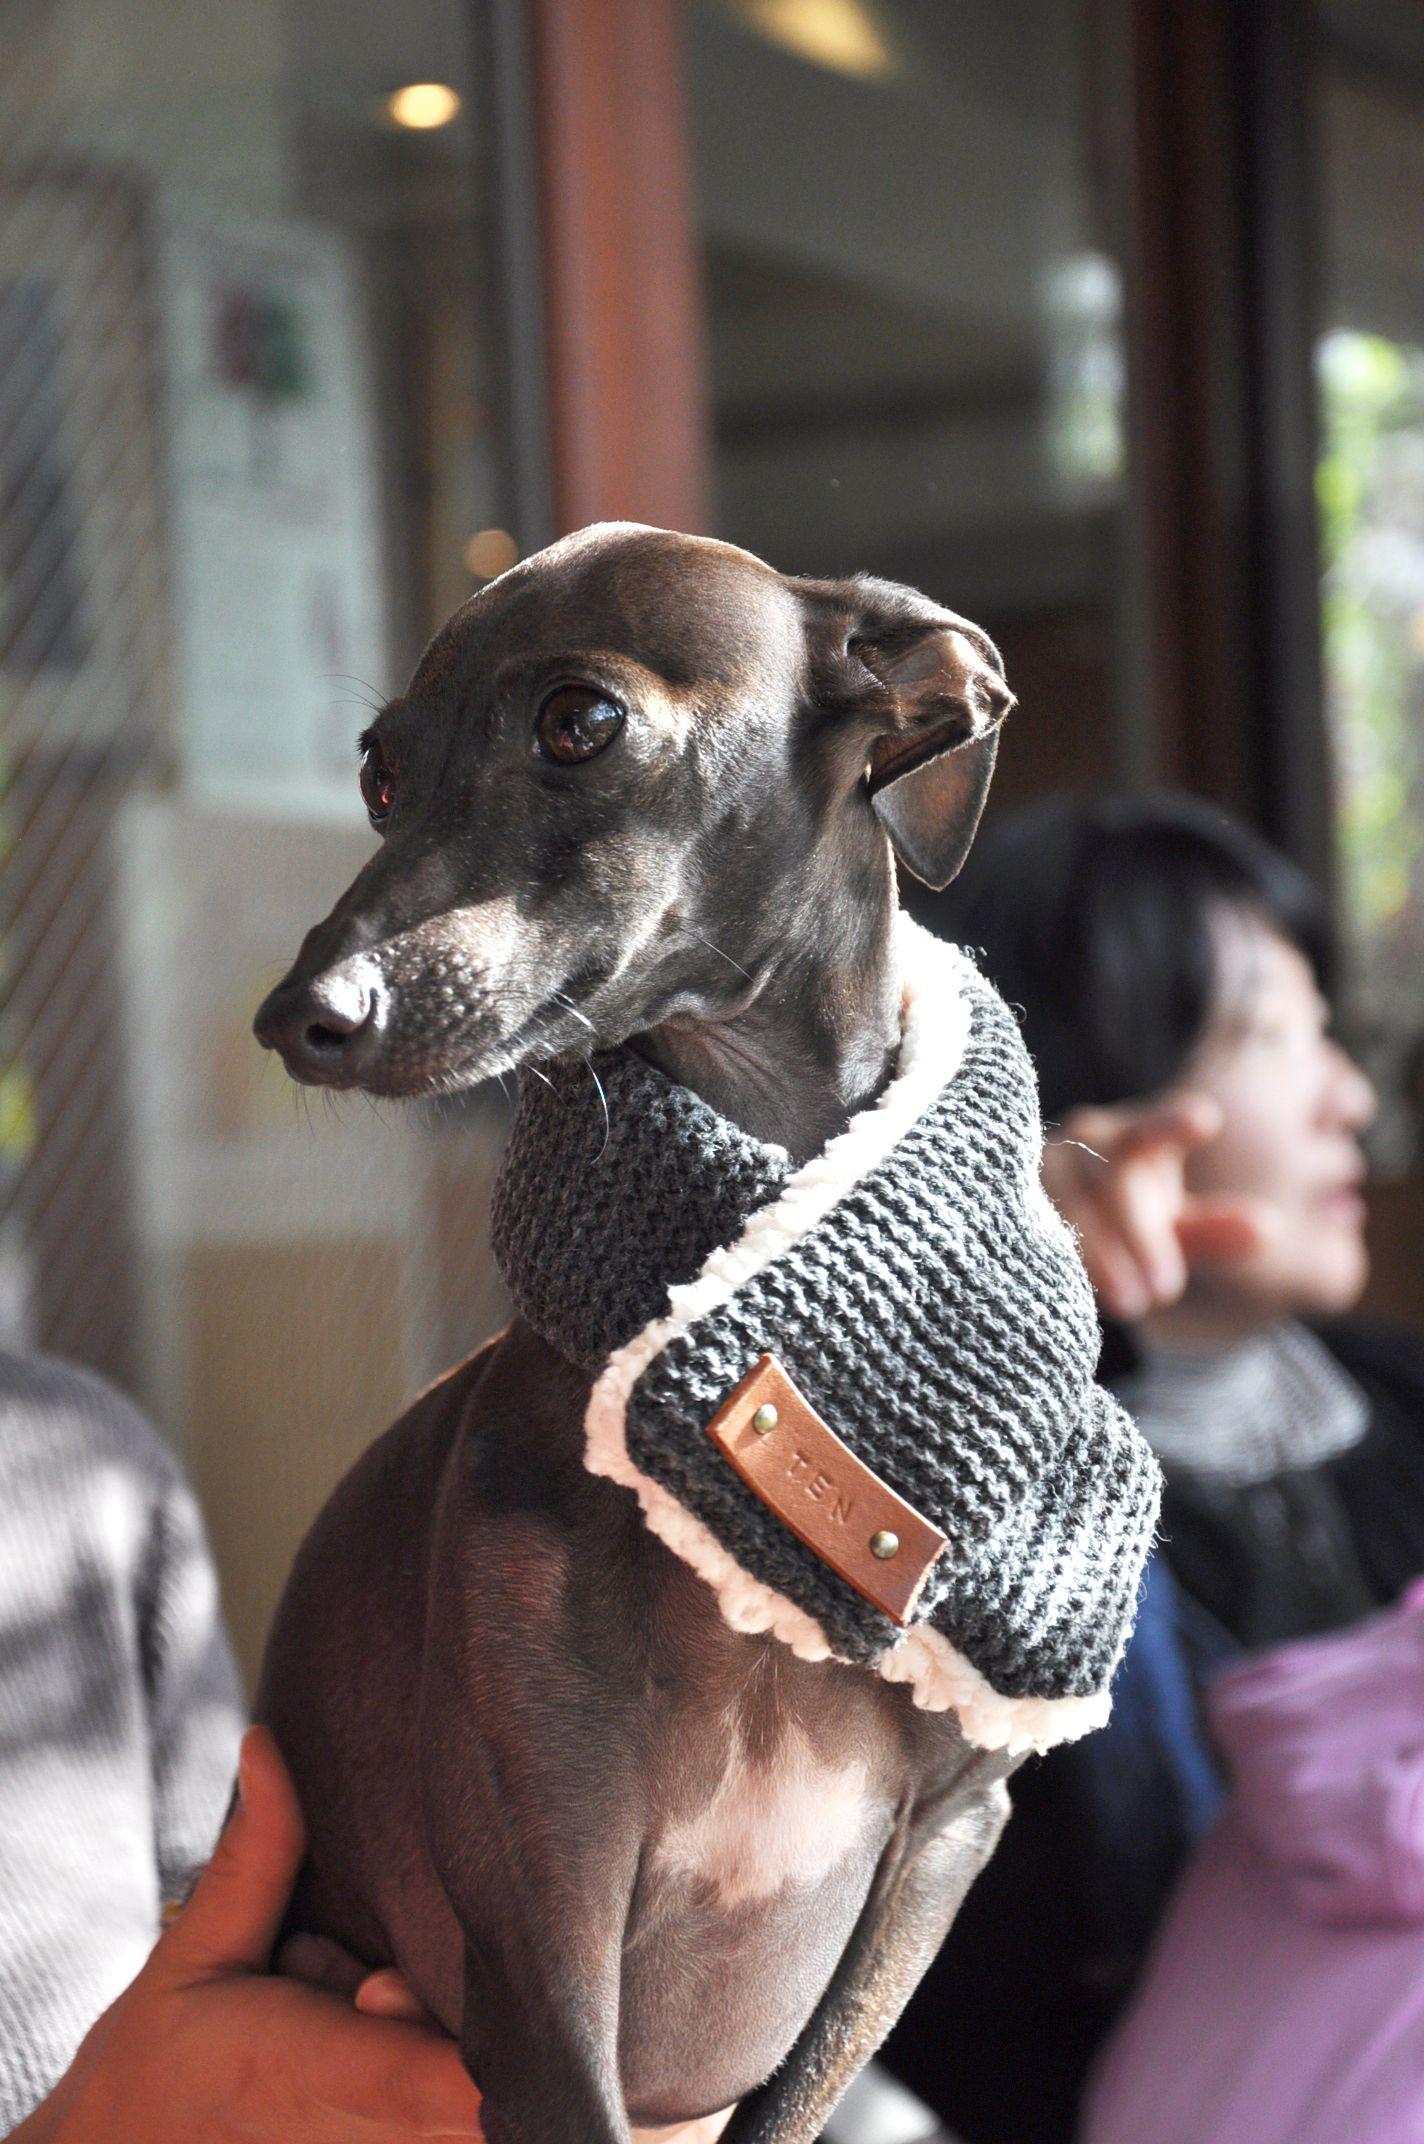 059b73e0ceb Ten   Italian greyhound  Italiangreyhound  dog